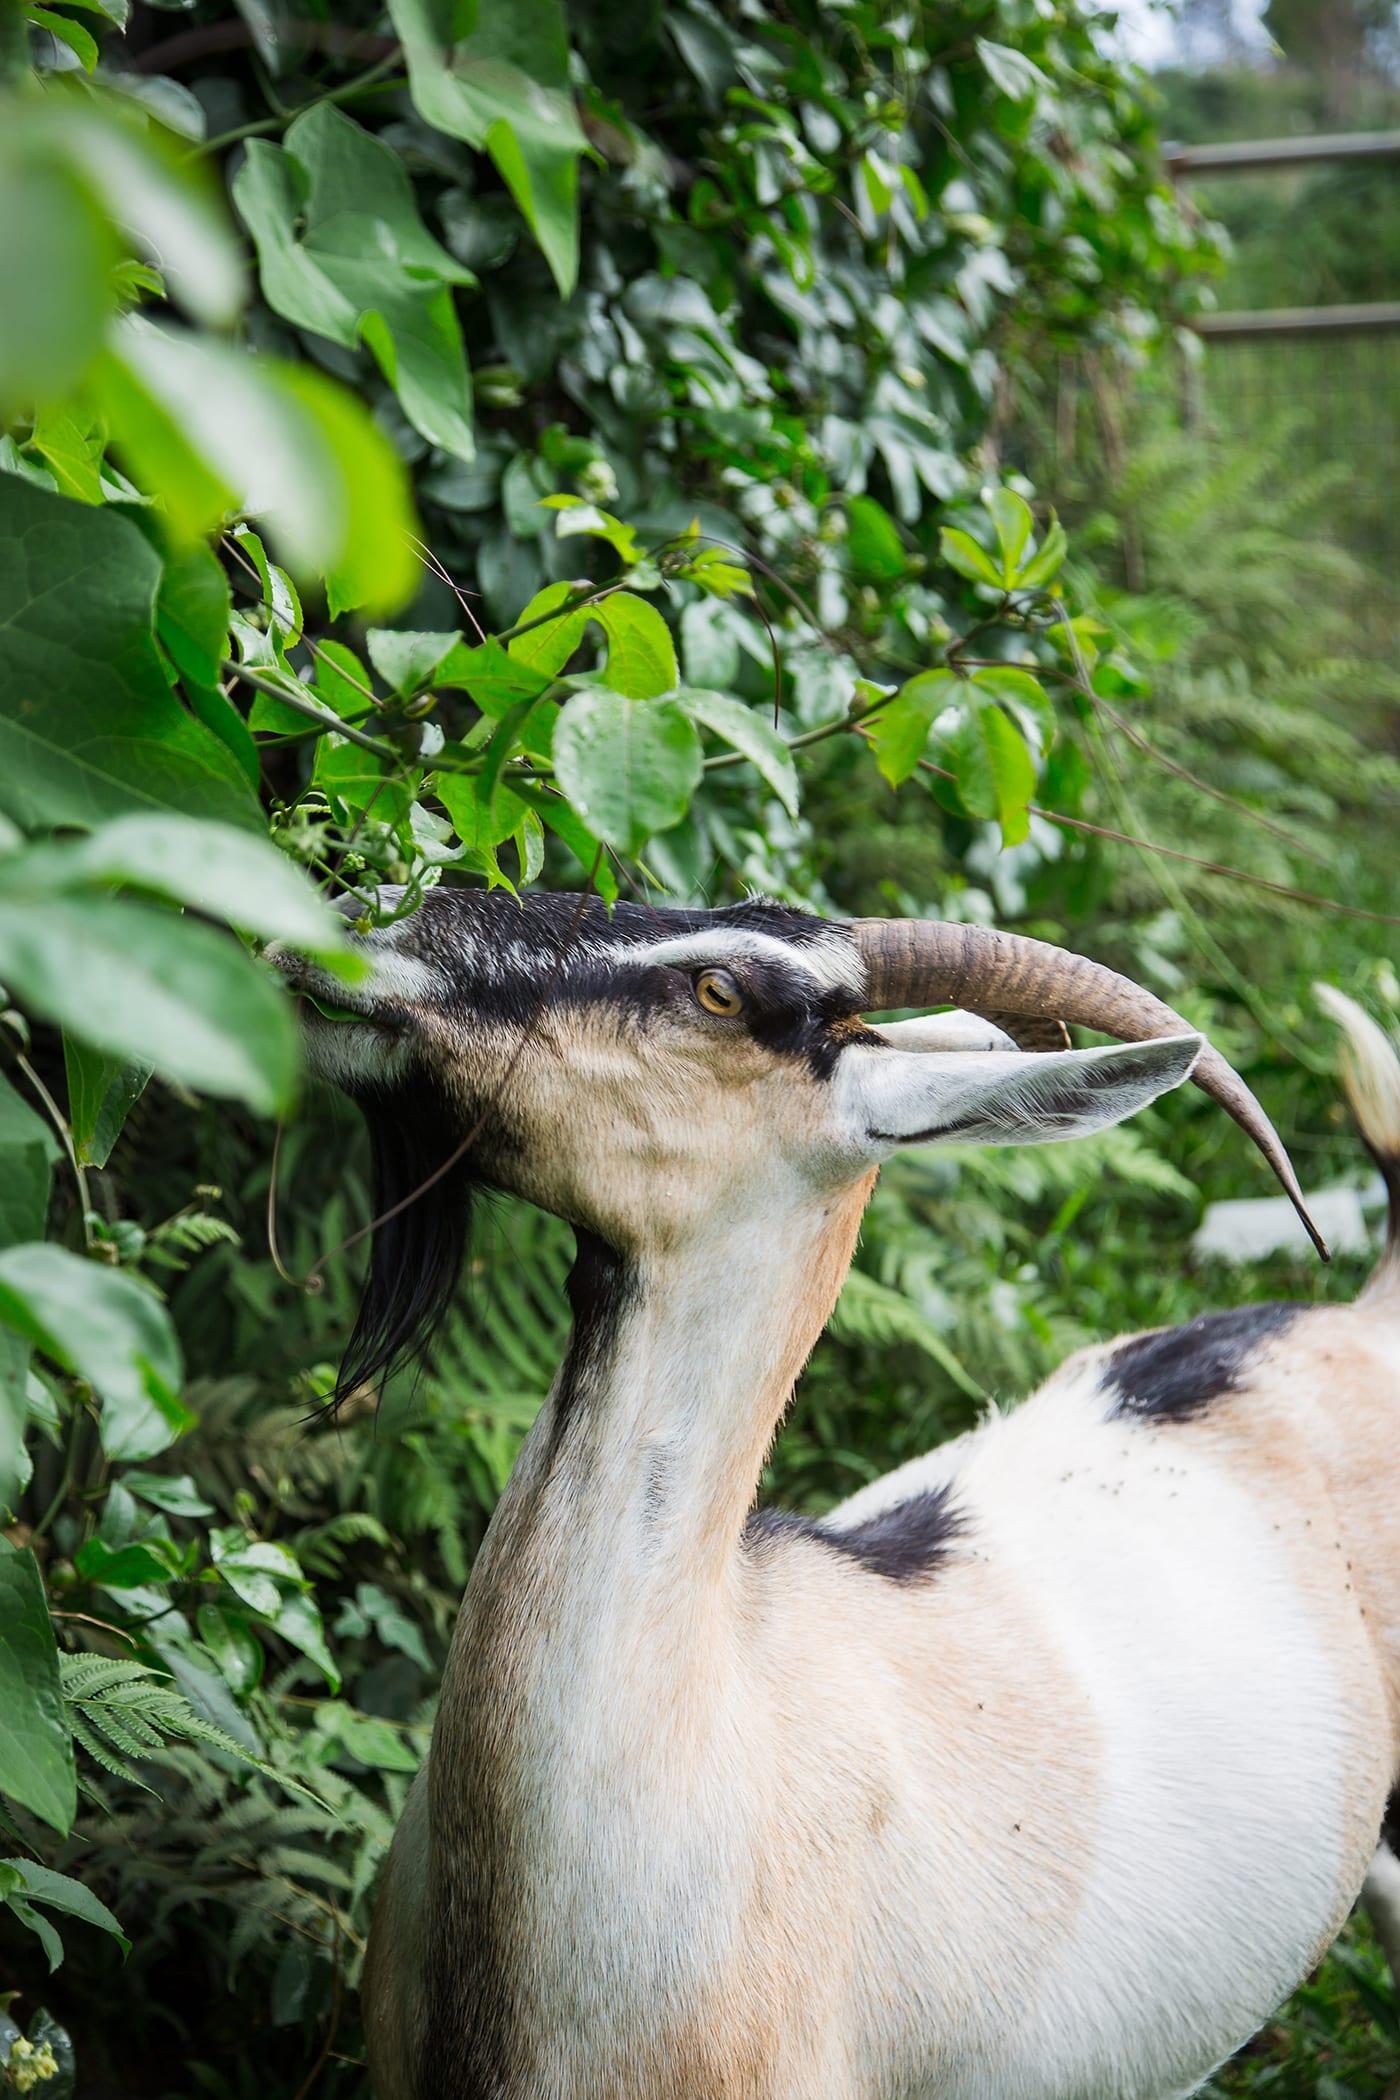 Sunshower-Farms-About-The-Farm-Goats-Visit-Hawaii.jpg